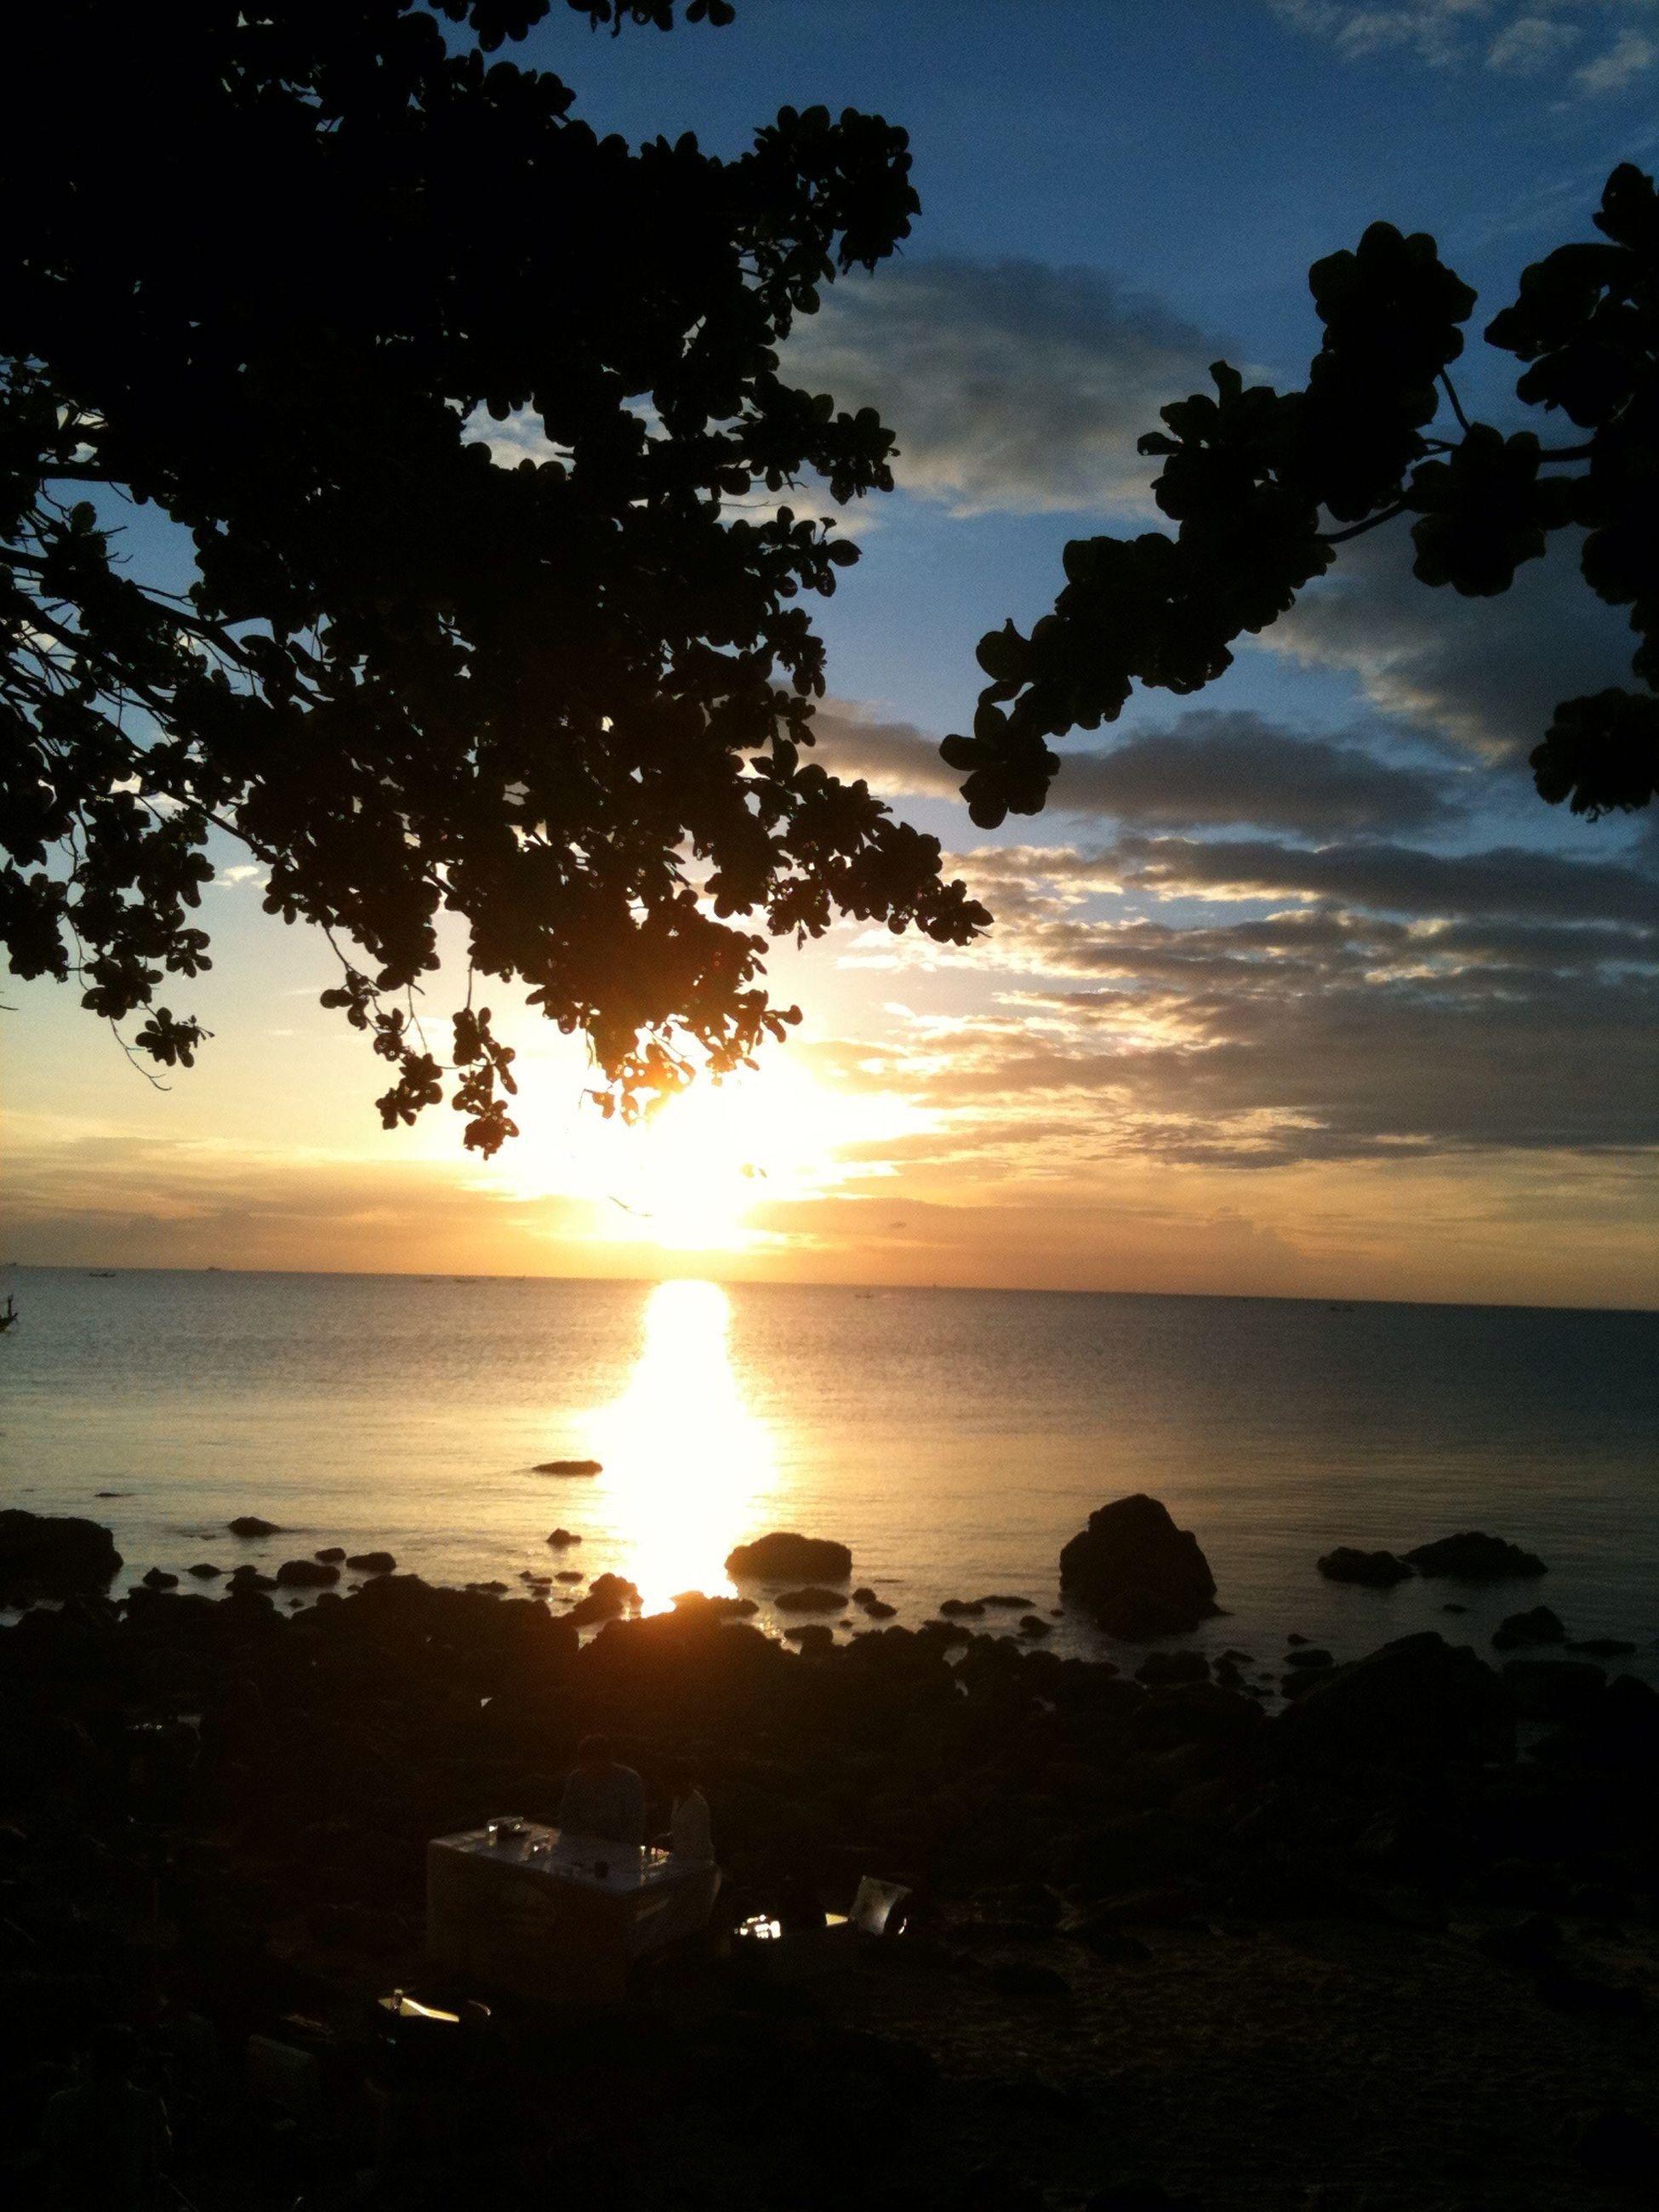 sunset, sea, sun, horizon over water, tranquil scene, scenics, tranquility, water, beauty in nature, sky, beach, nature, idyllic, silhouette, shore, orange color, sunlight, tree, cloud - sky, reflection